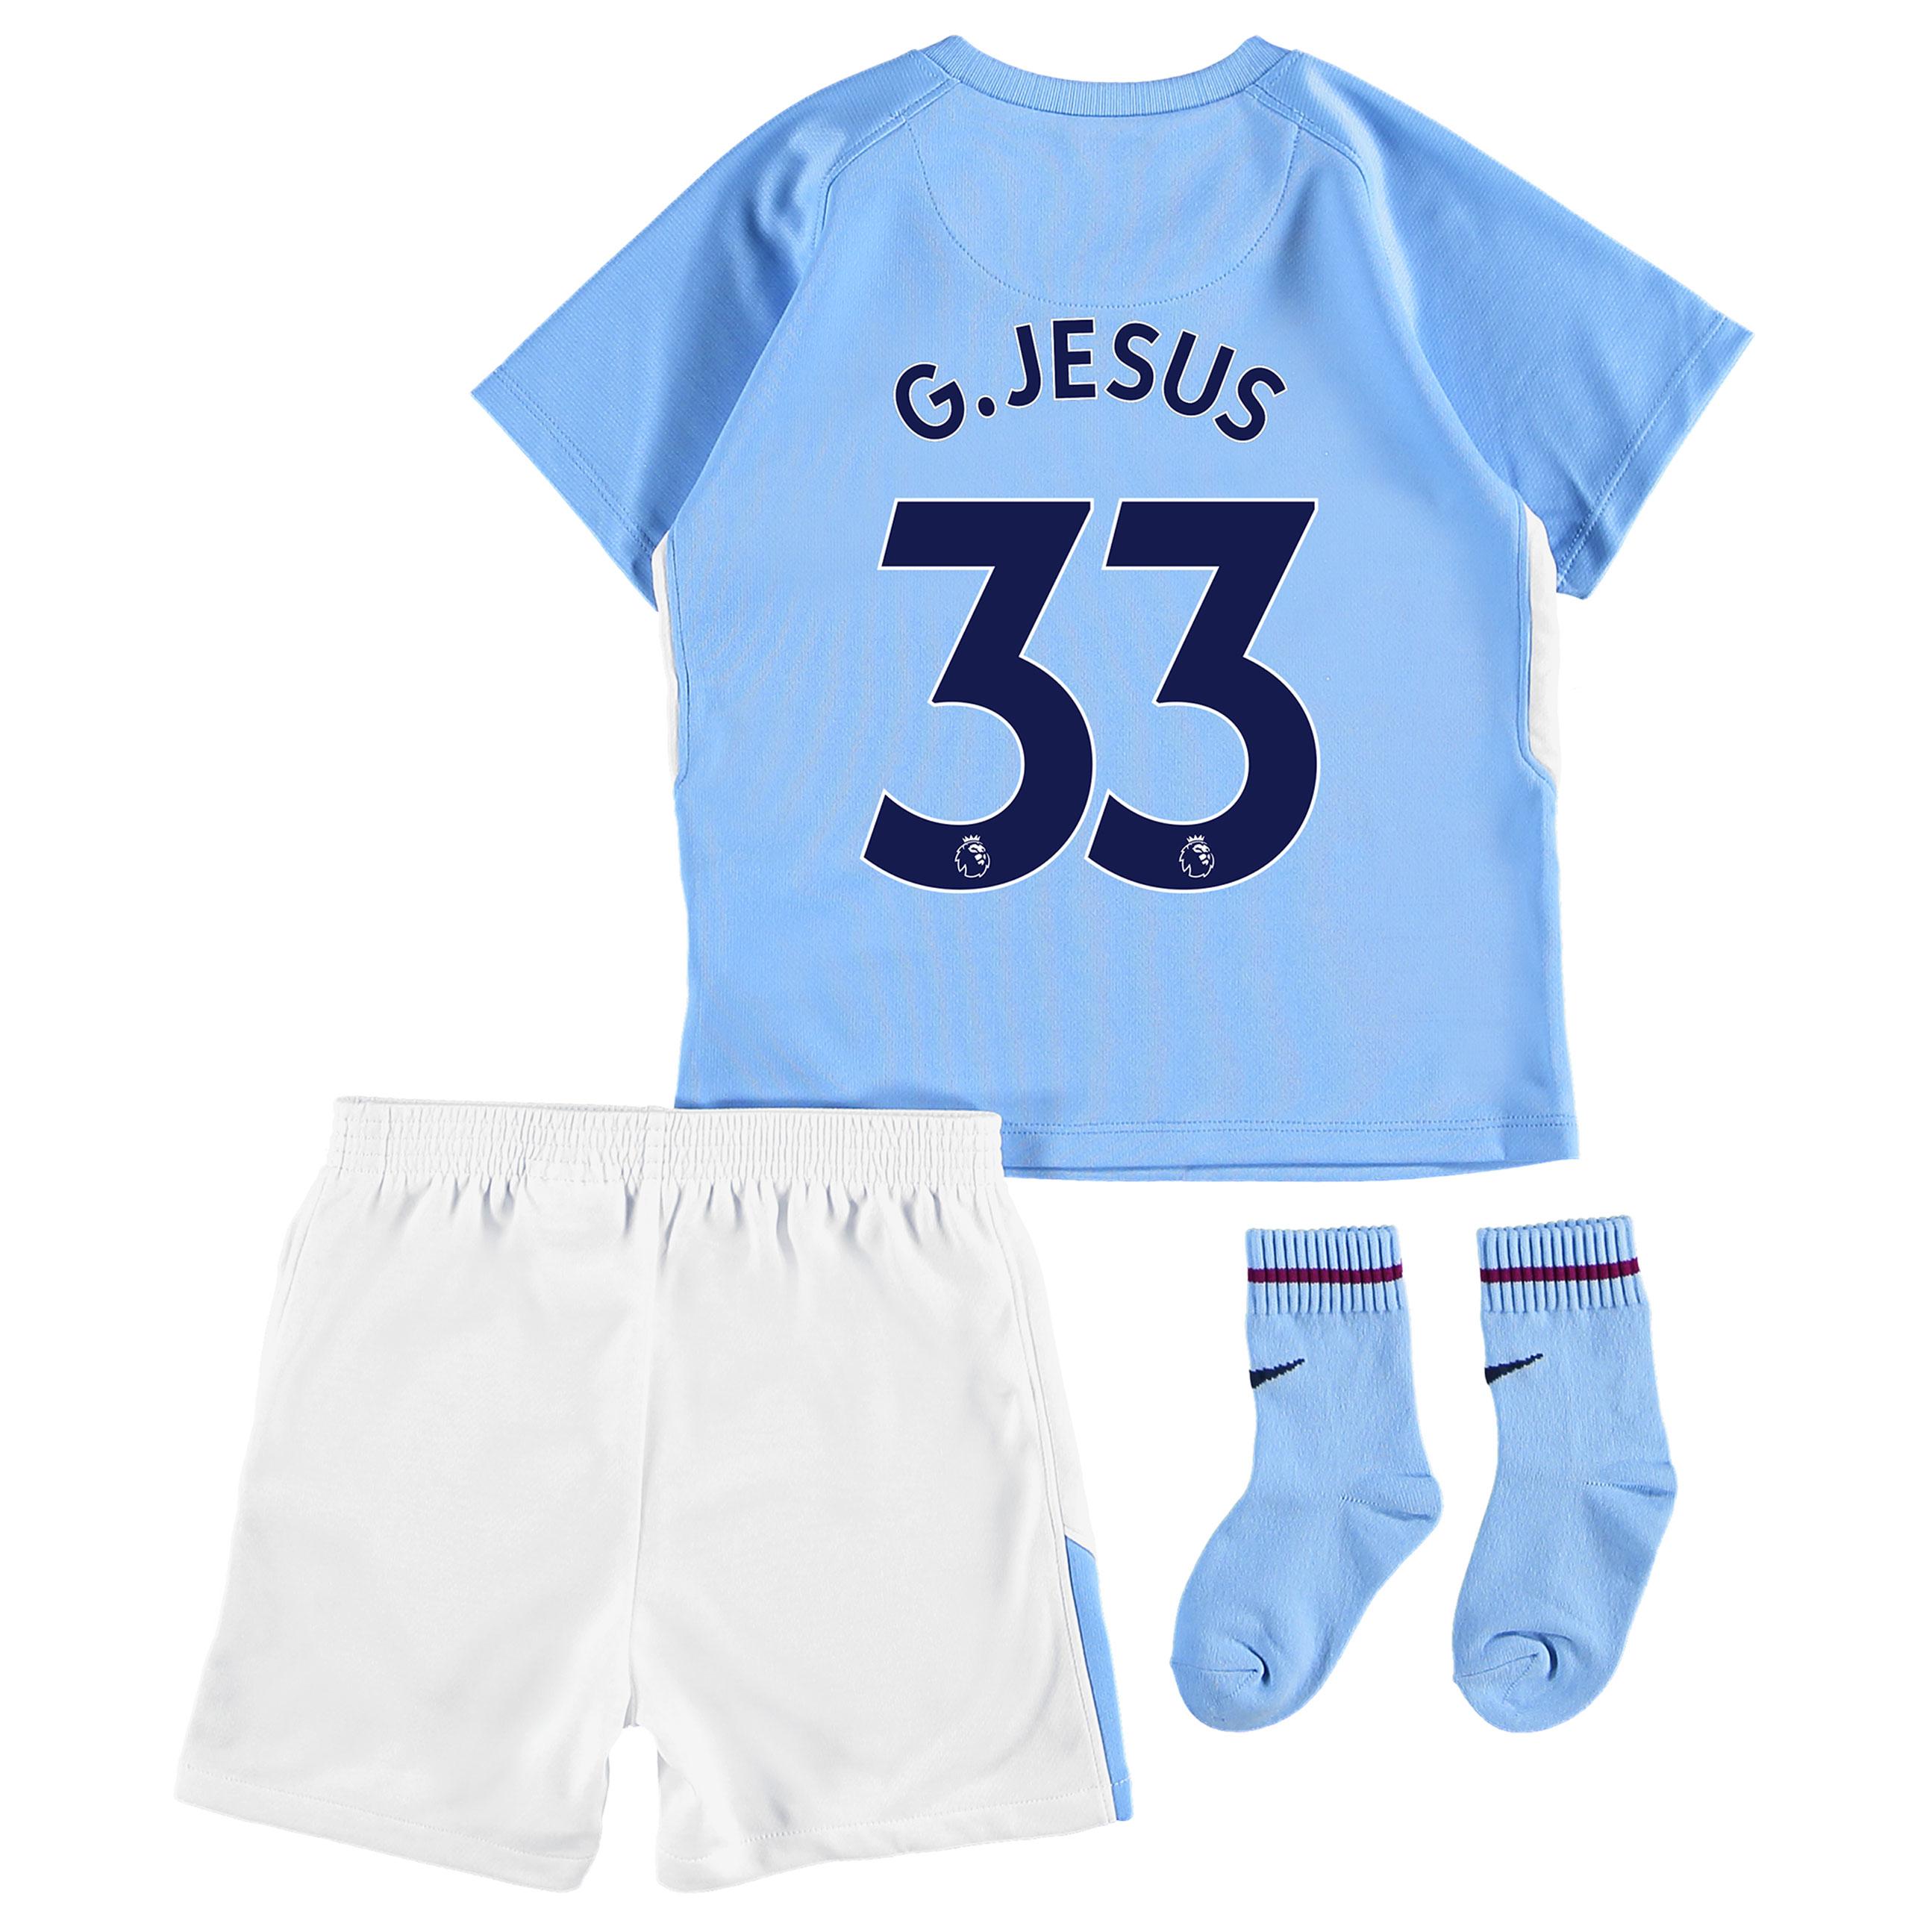 Manchester City Home Stadium Kit 2017-18 - Infants with G.Jesus 33 pri